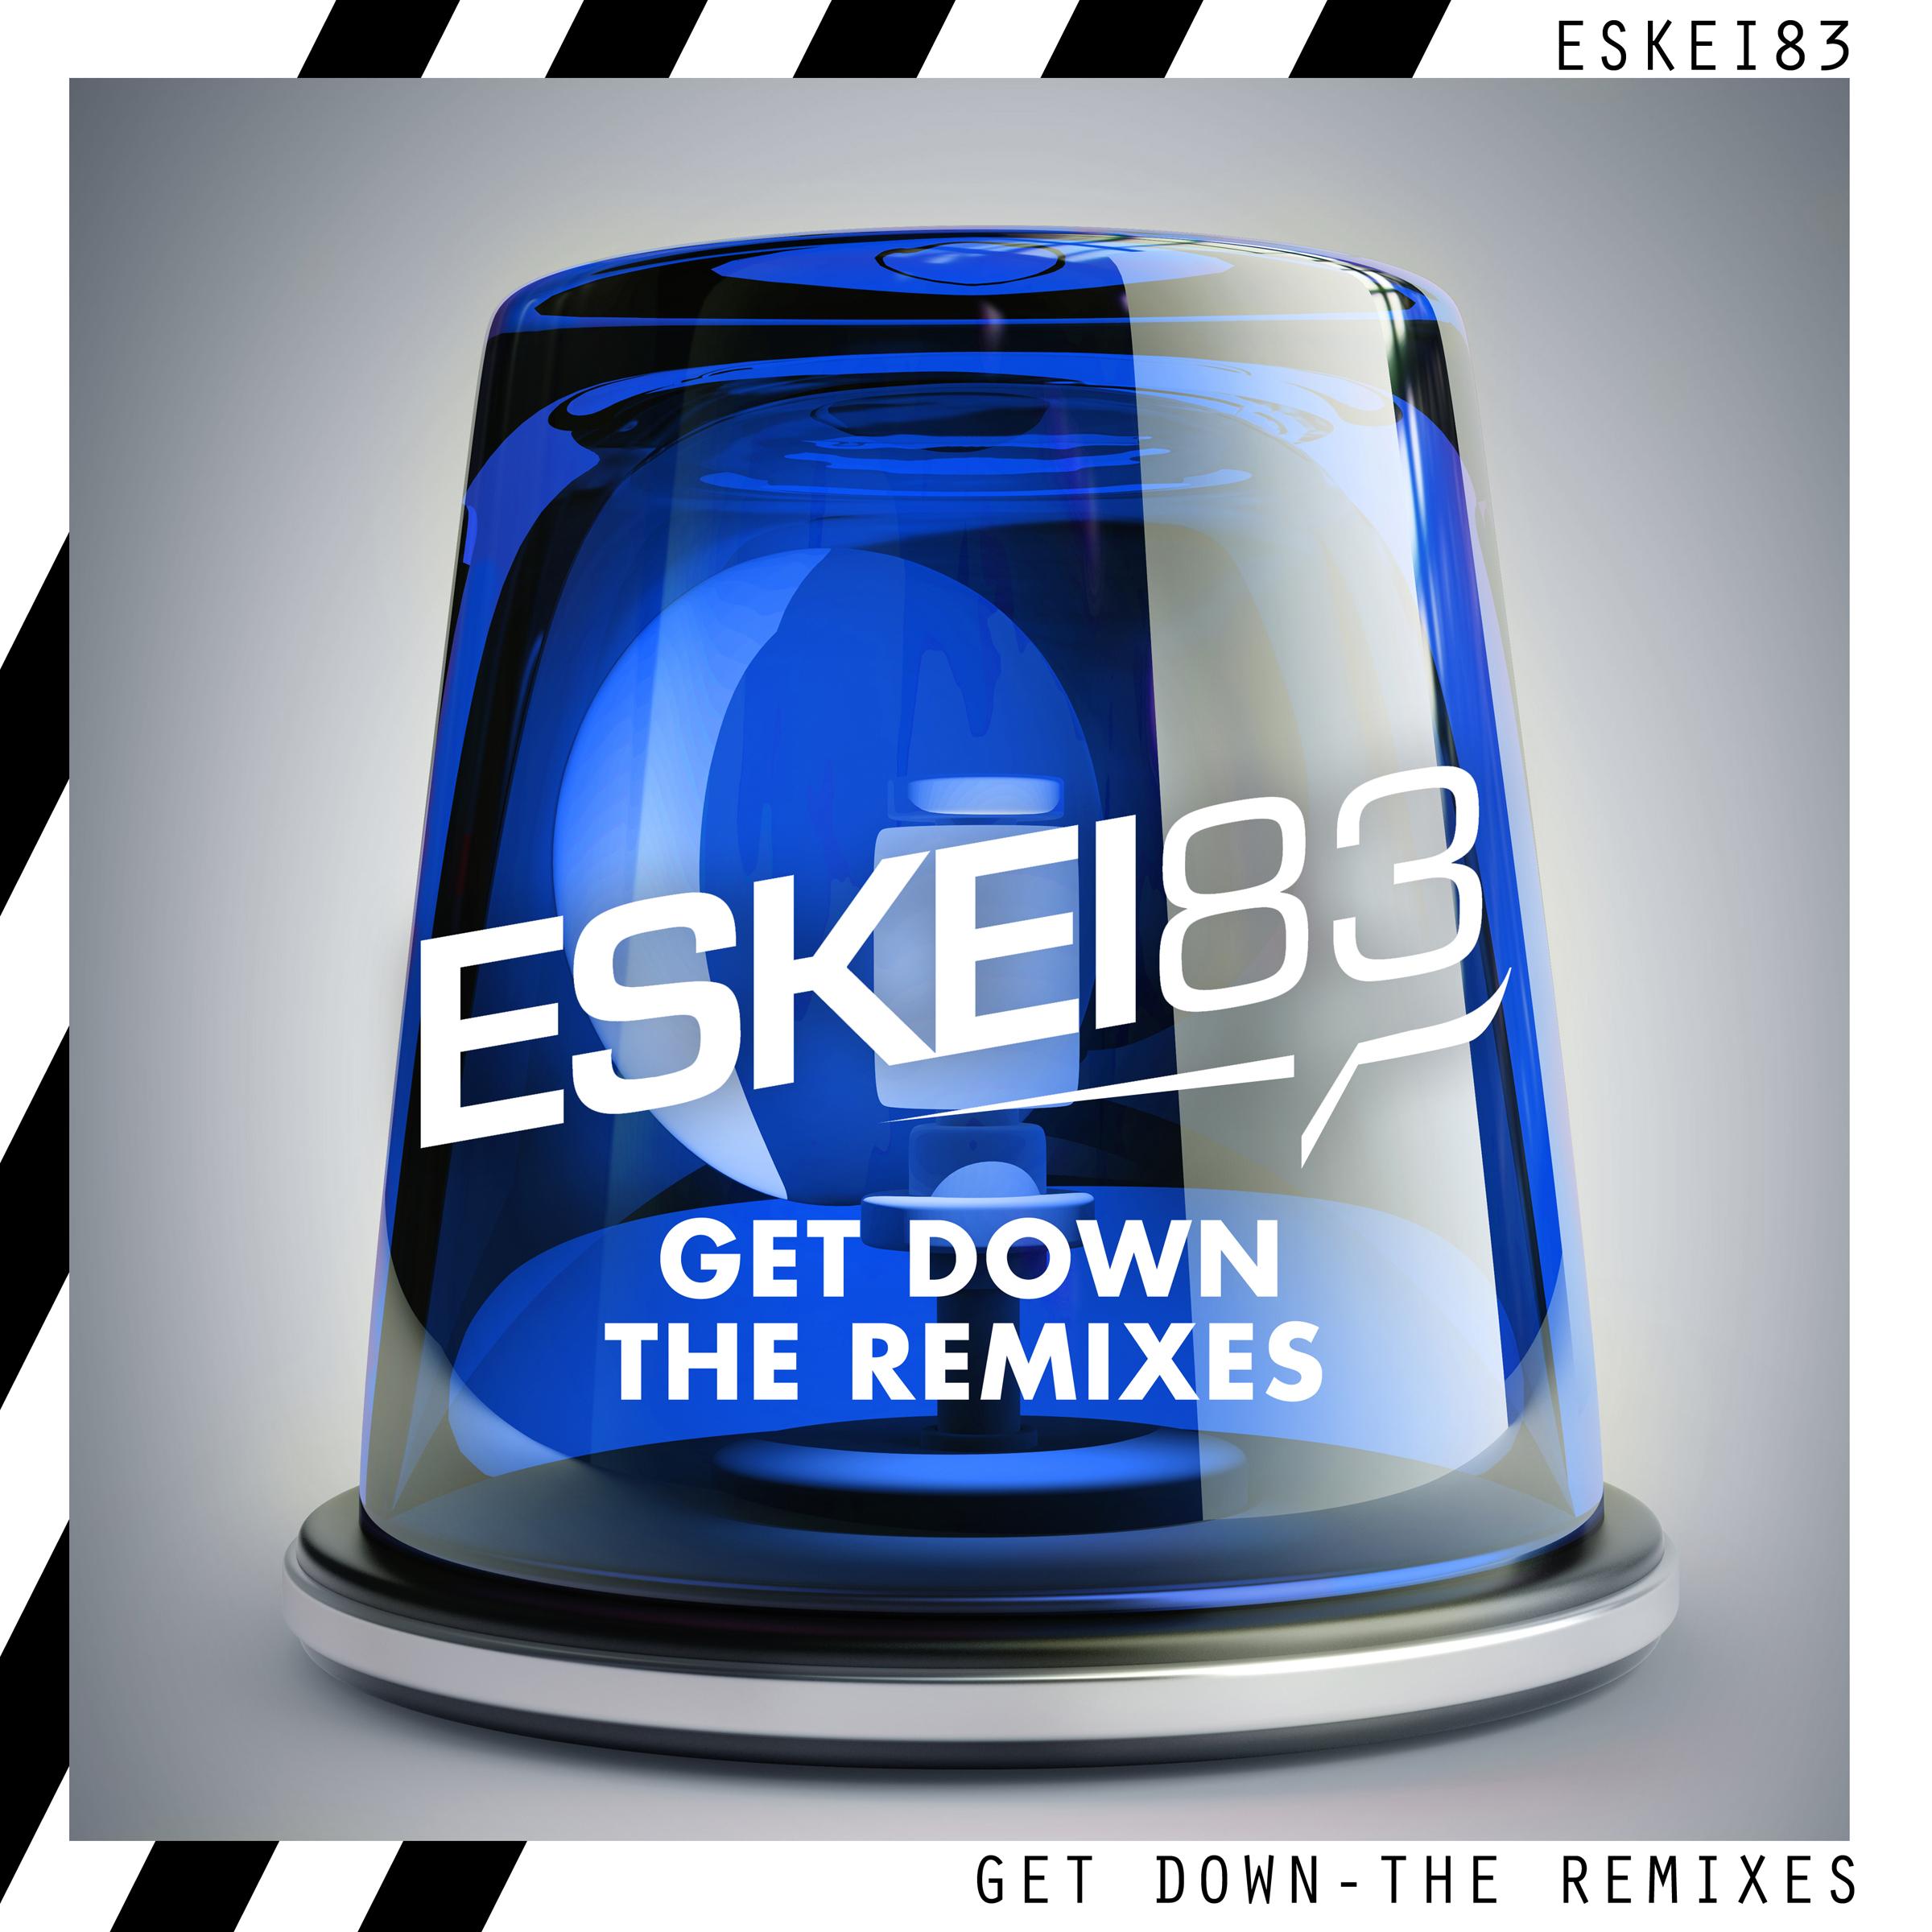 CZ_ESKEI83_GETDOWN_REMIXes